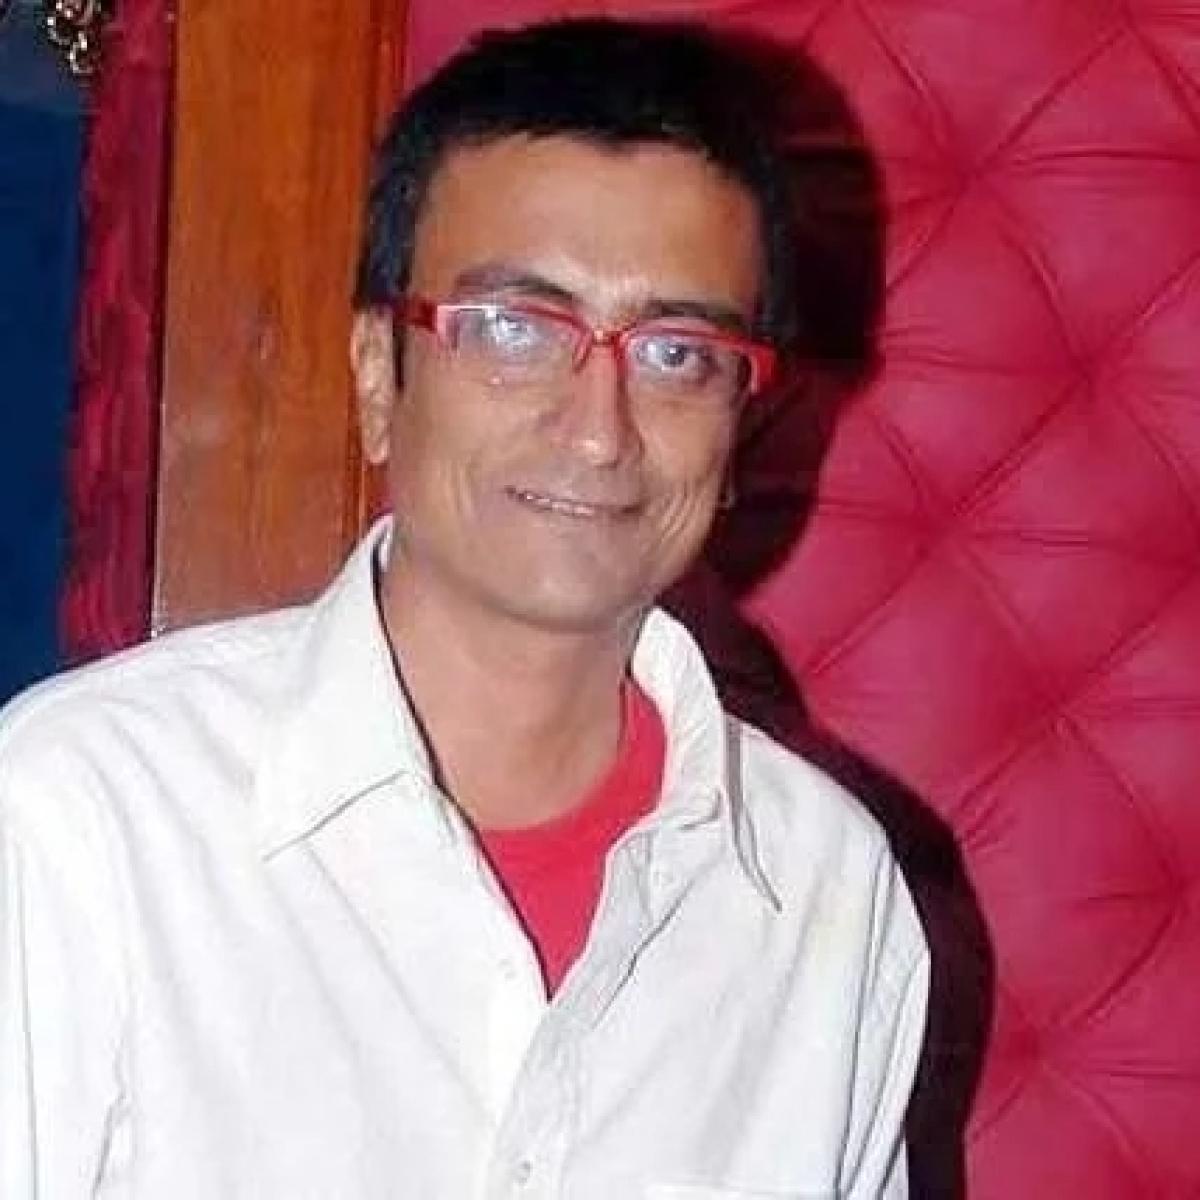 Champak Chacha from 'Taarak Mehta Ka Oolta Chashmah' issues apology to Raj Thackeray over language remark